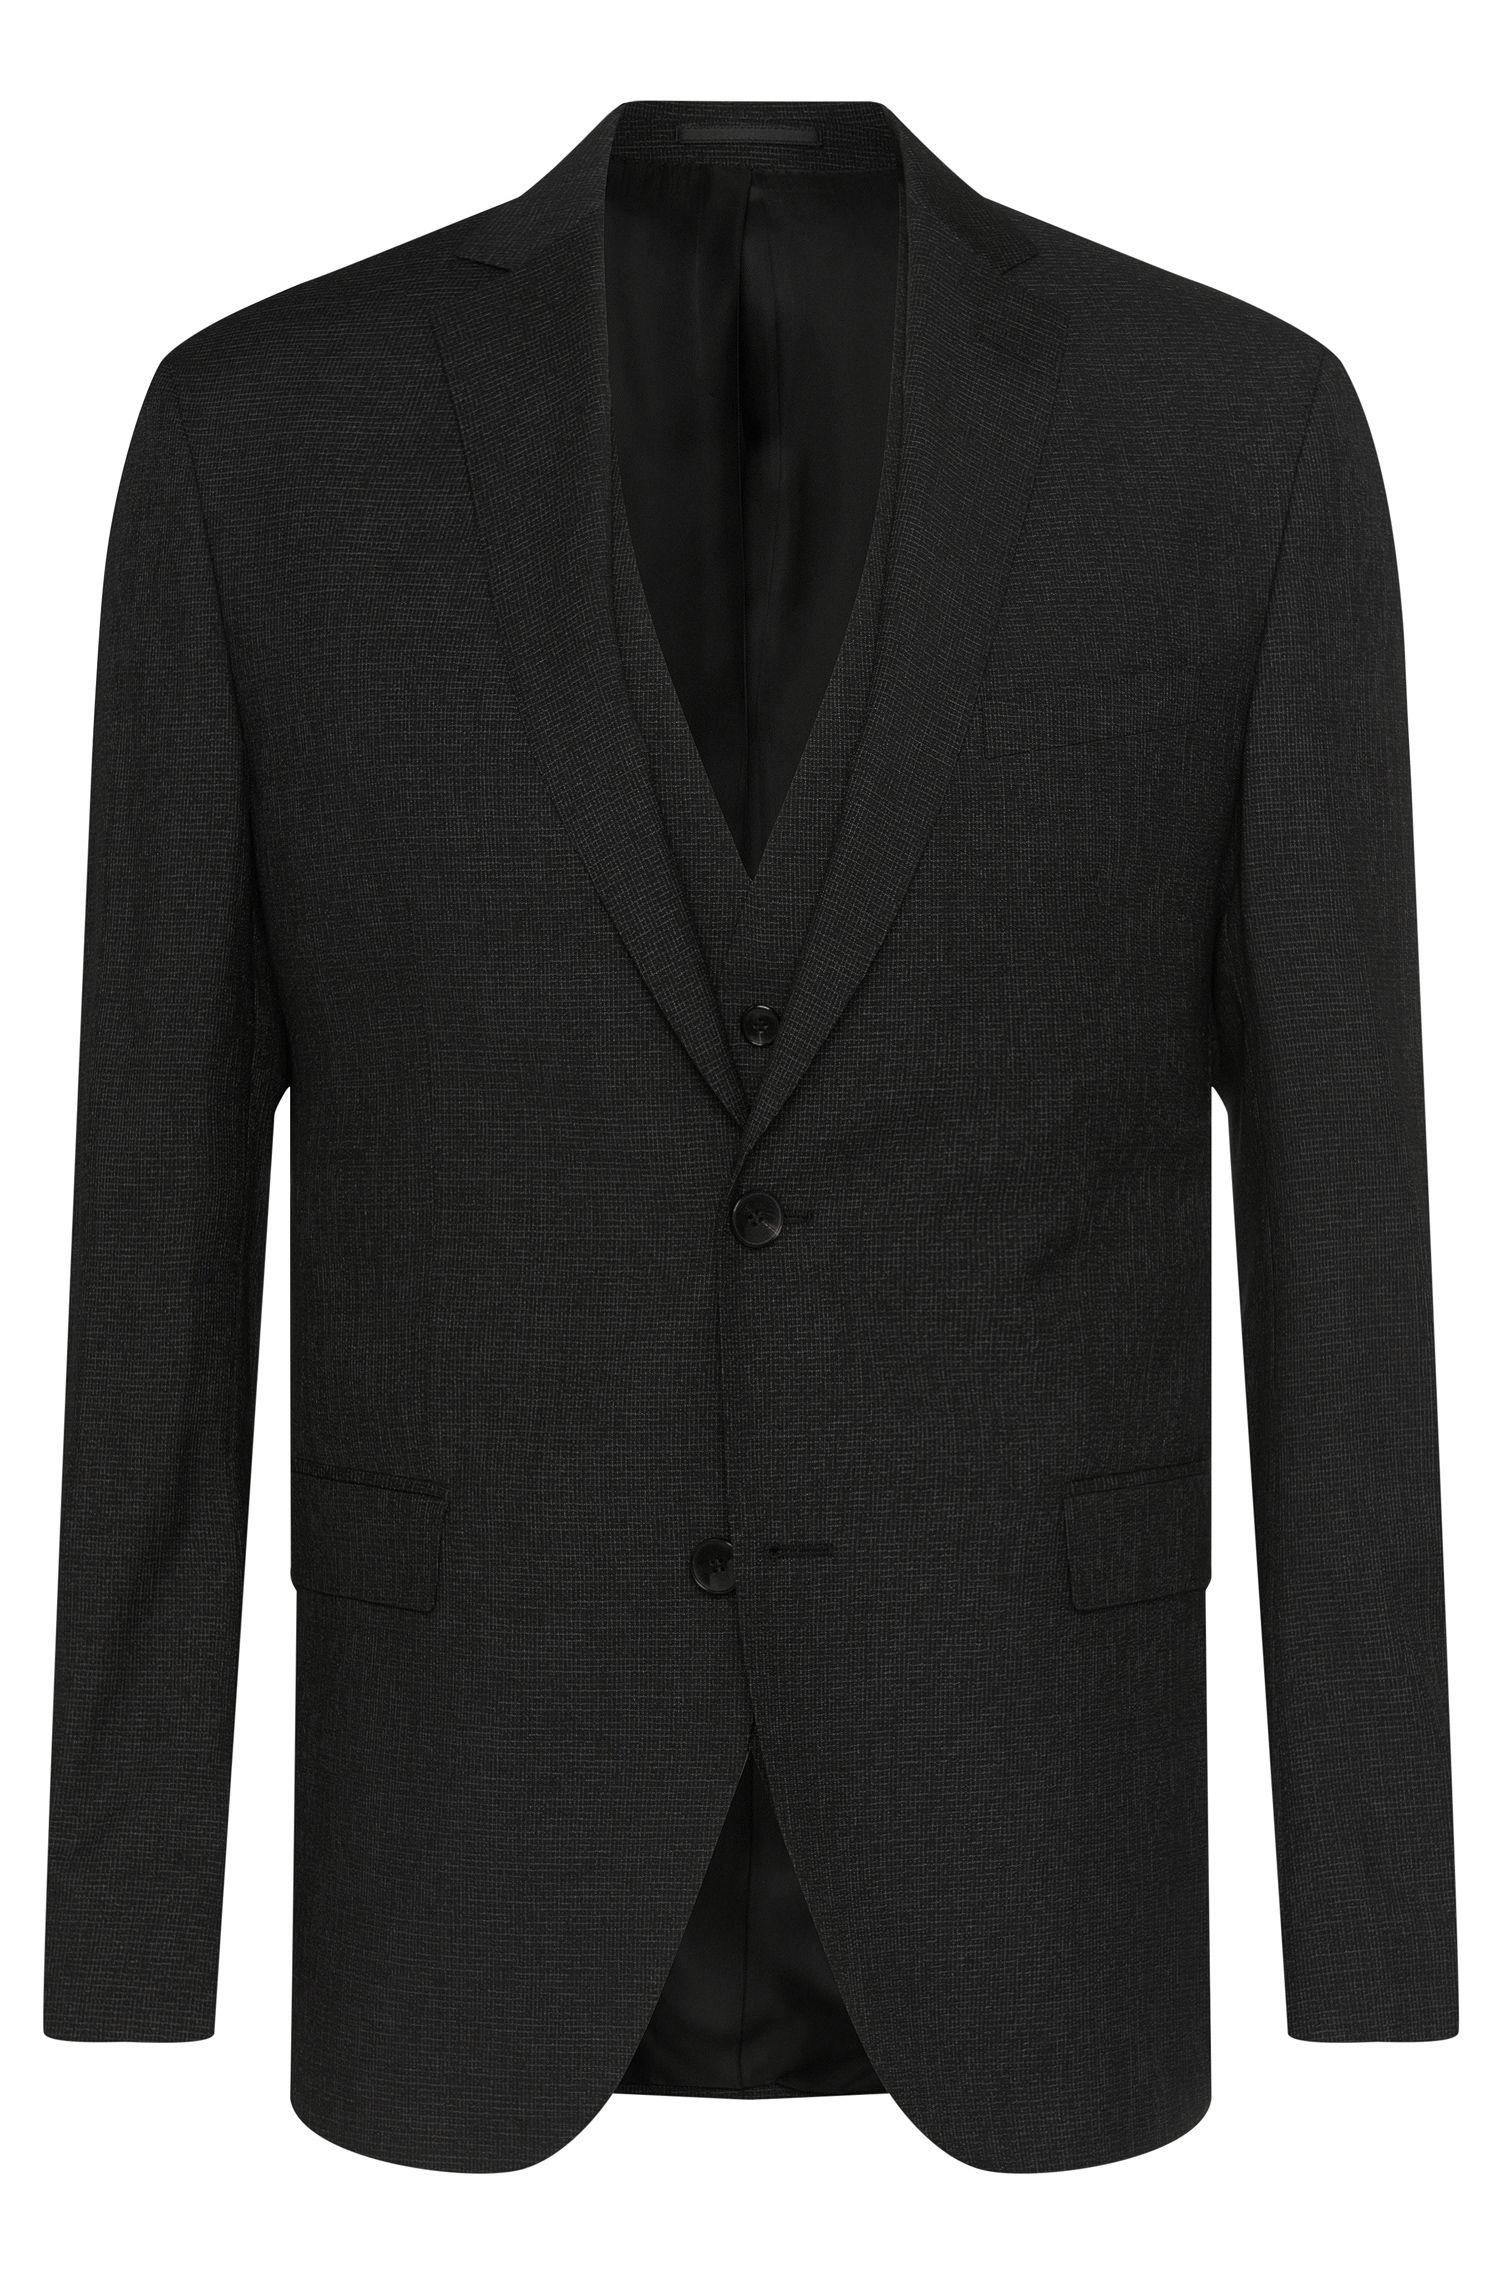 Wool-Silk 3-Piece Suit, Extra Slim Fit | Reyno/Wave WE